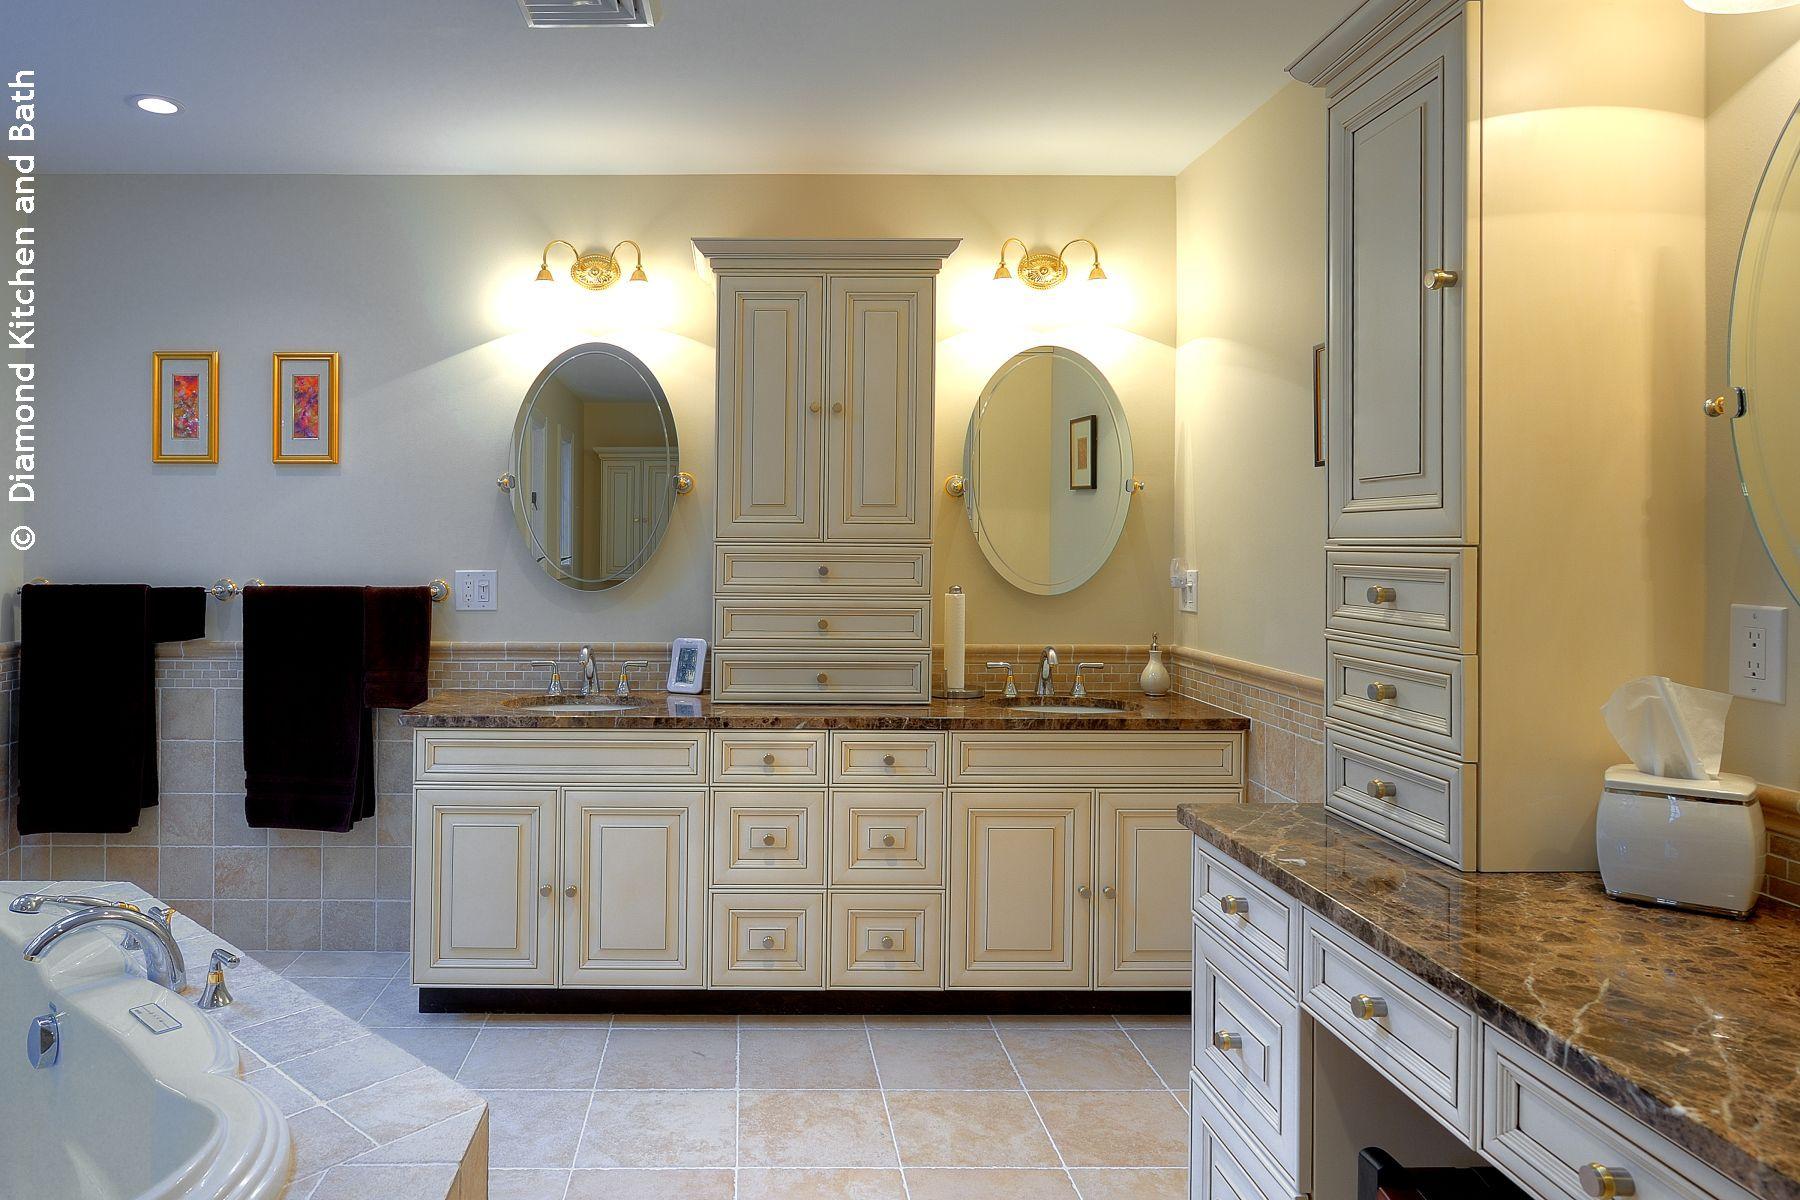 Bathroom Design Showroom diamond kitchen and bath, kitchen and bathroom design, showroom